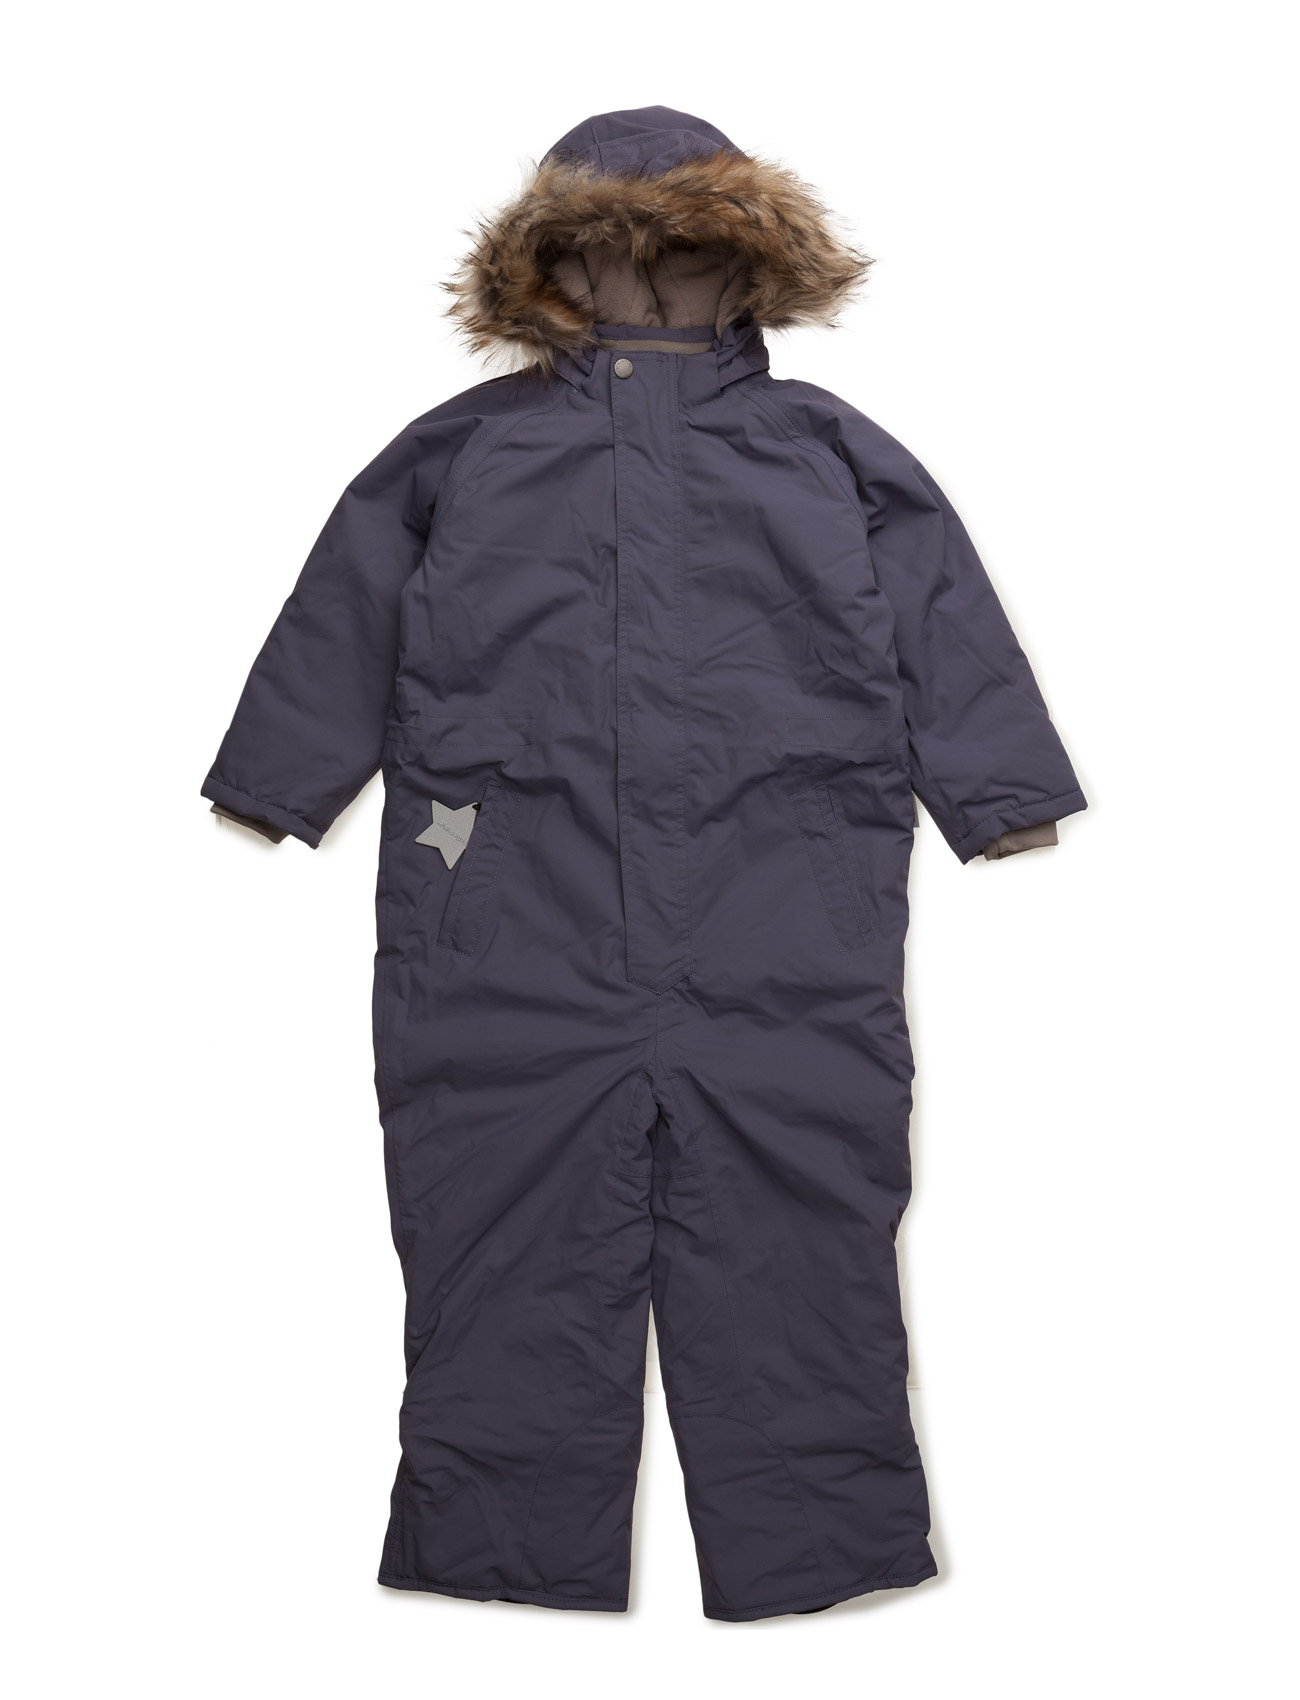 Wanni Faux-Fur, K Mini A Ture Overalls til Børn i